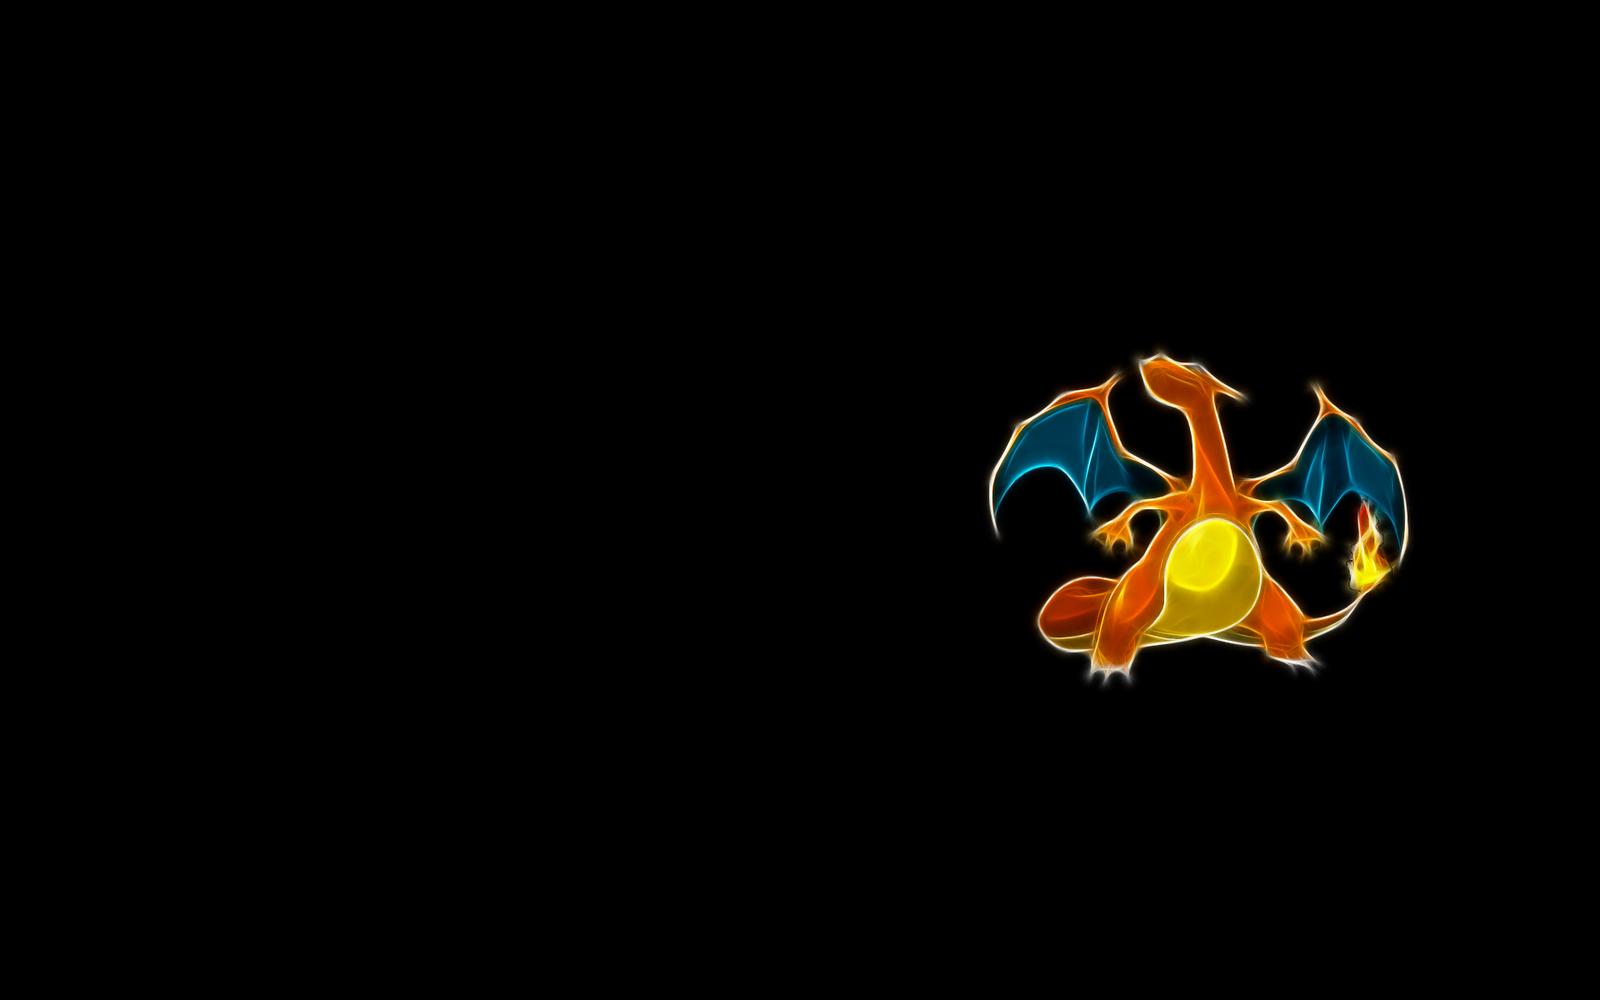 Cool Stuff Hurr: Pokemon wallpapers!